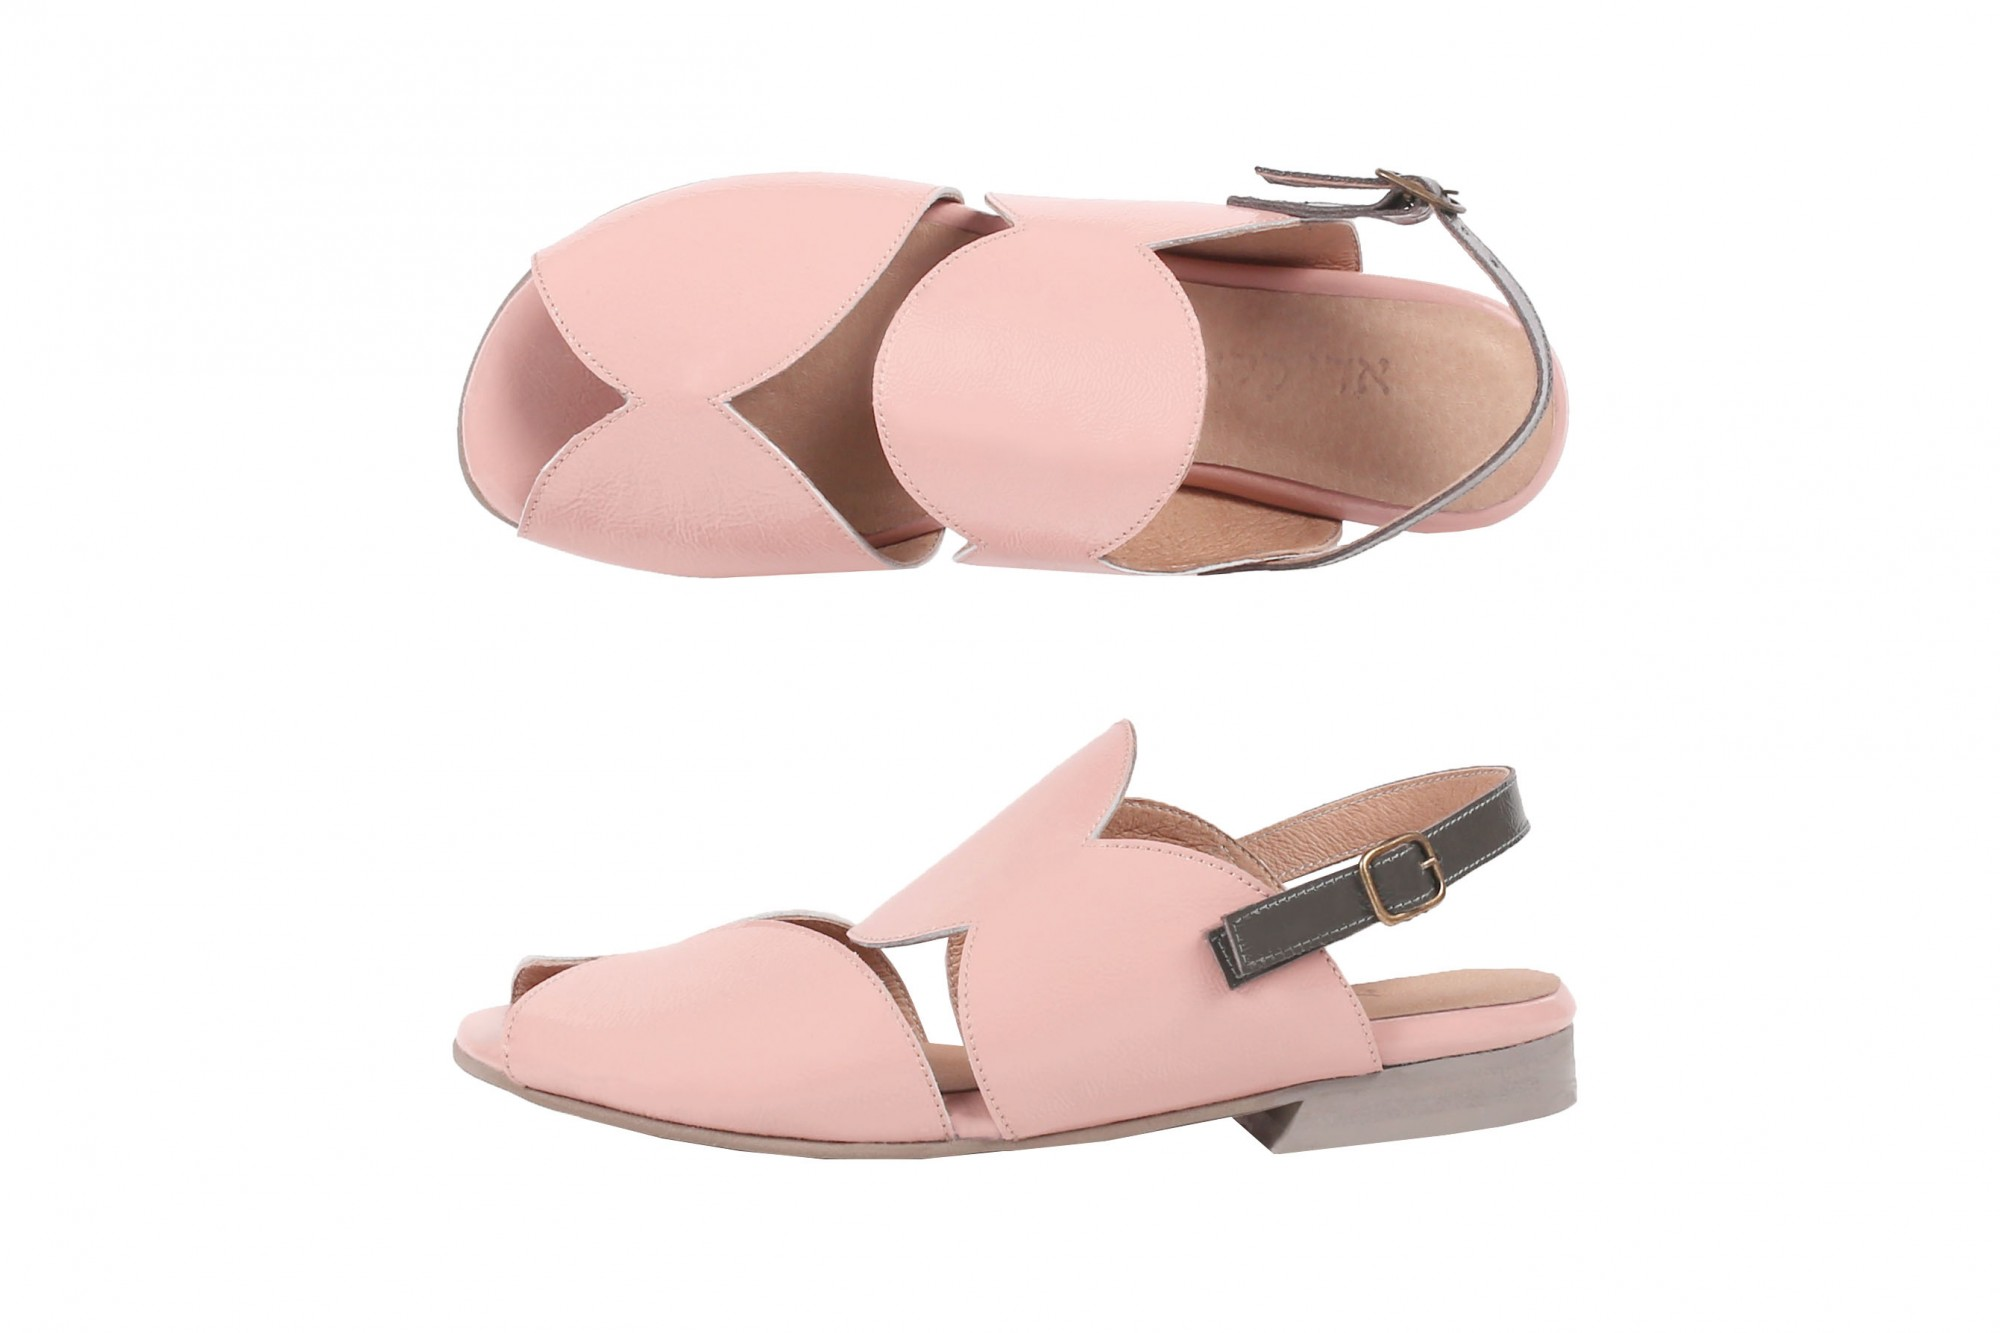 f33238f2e7931 Pink cutouts sandals